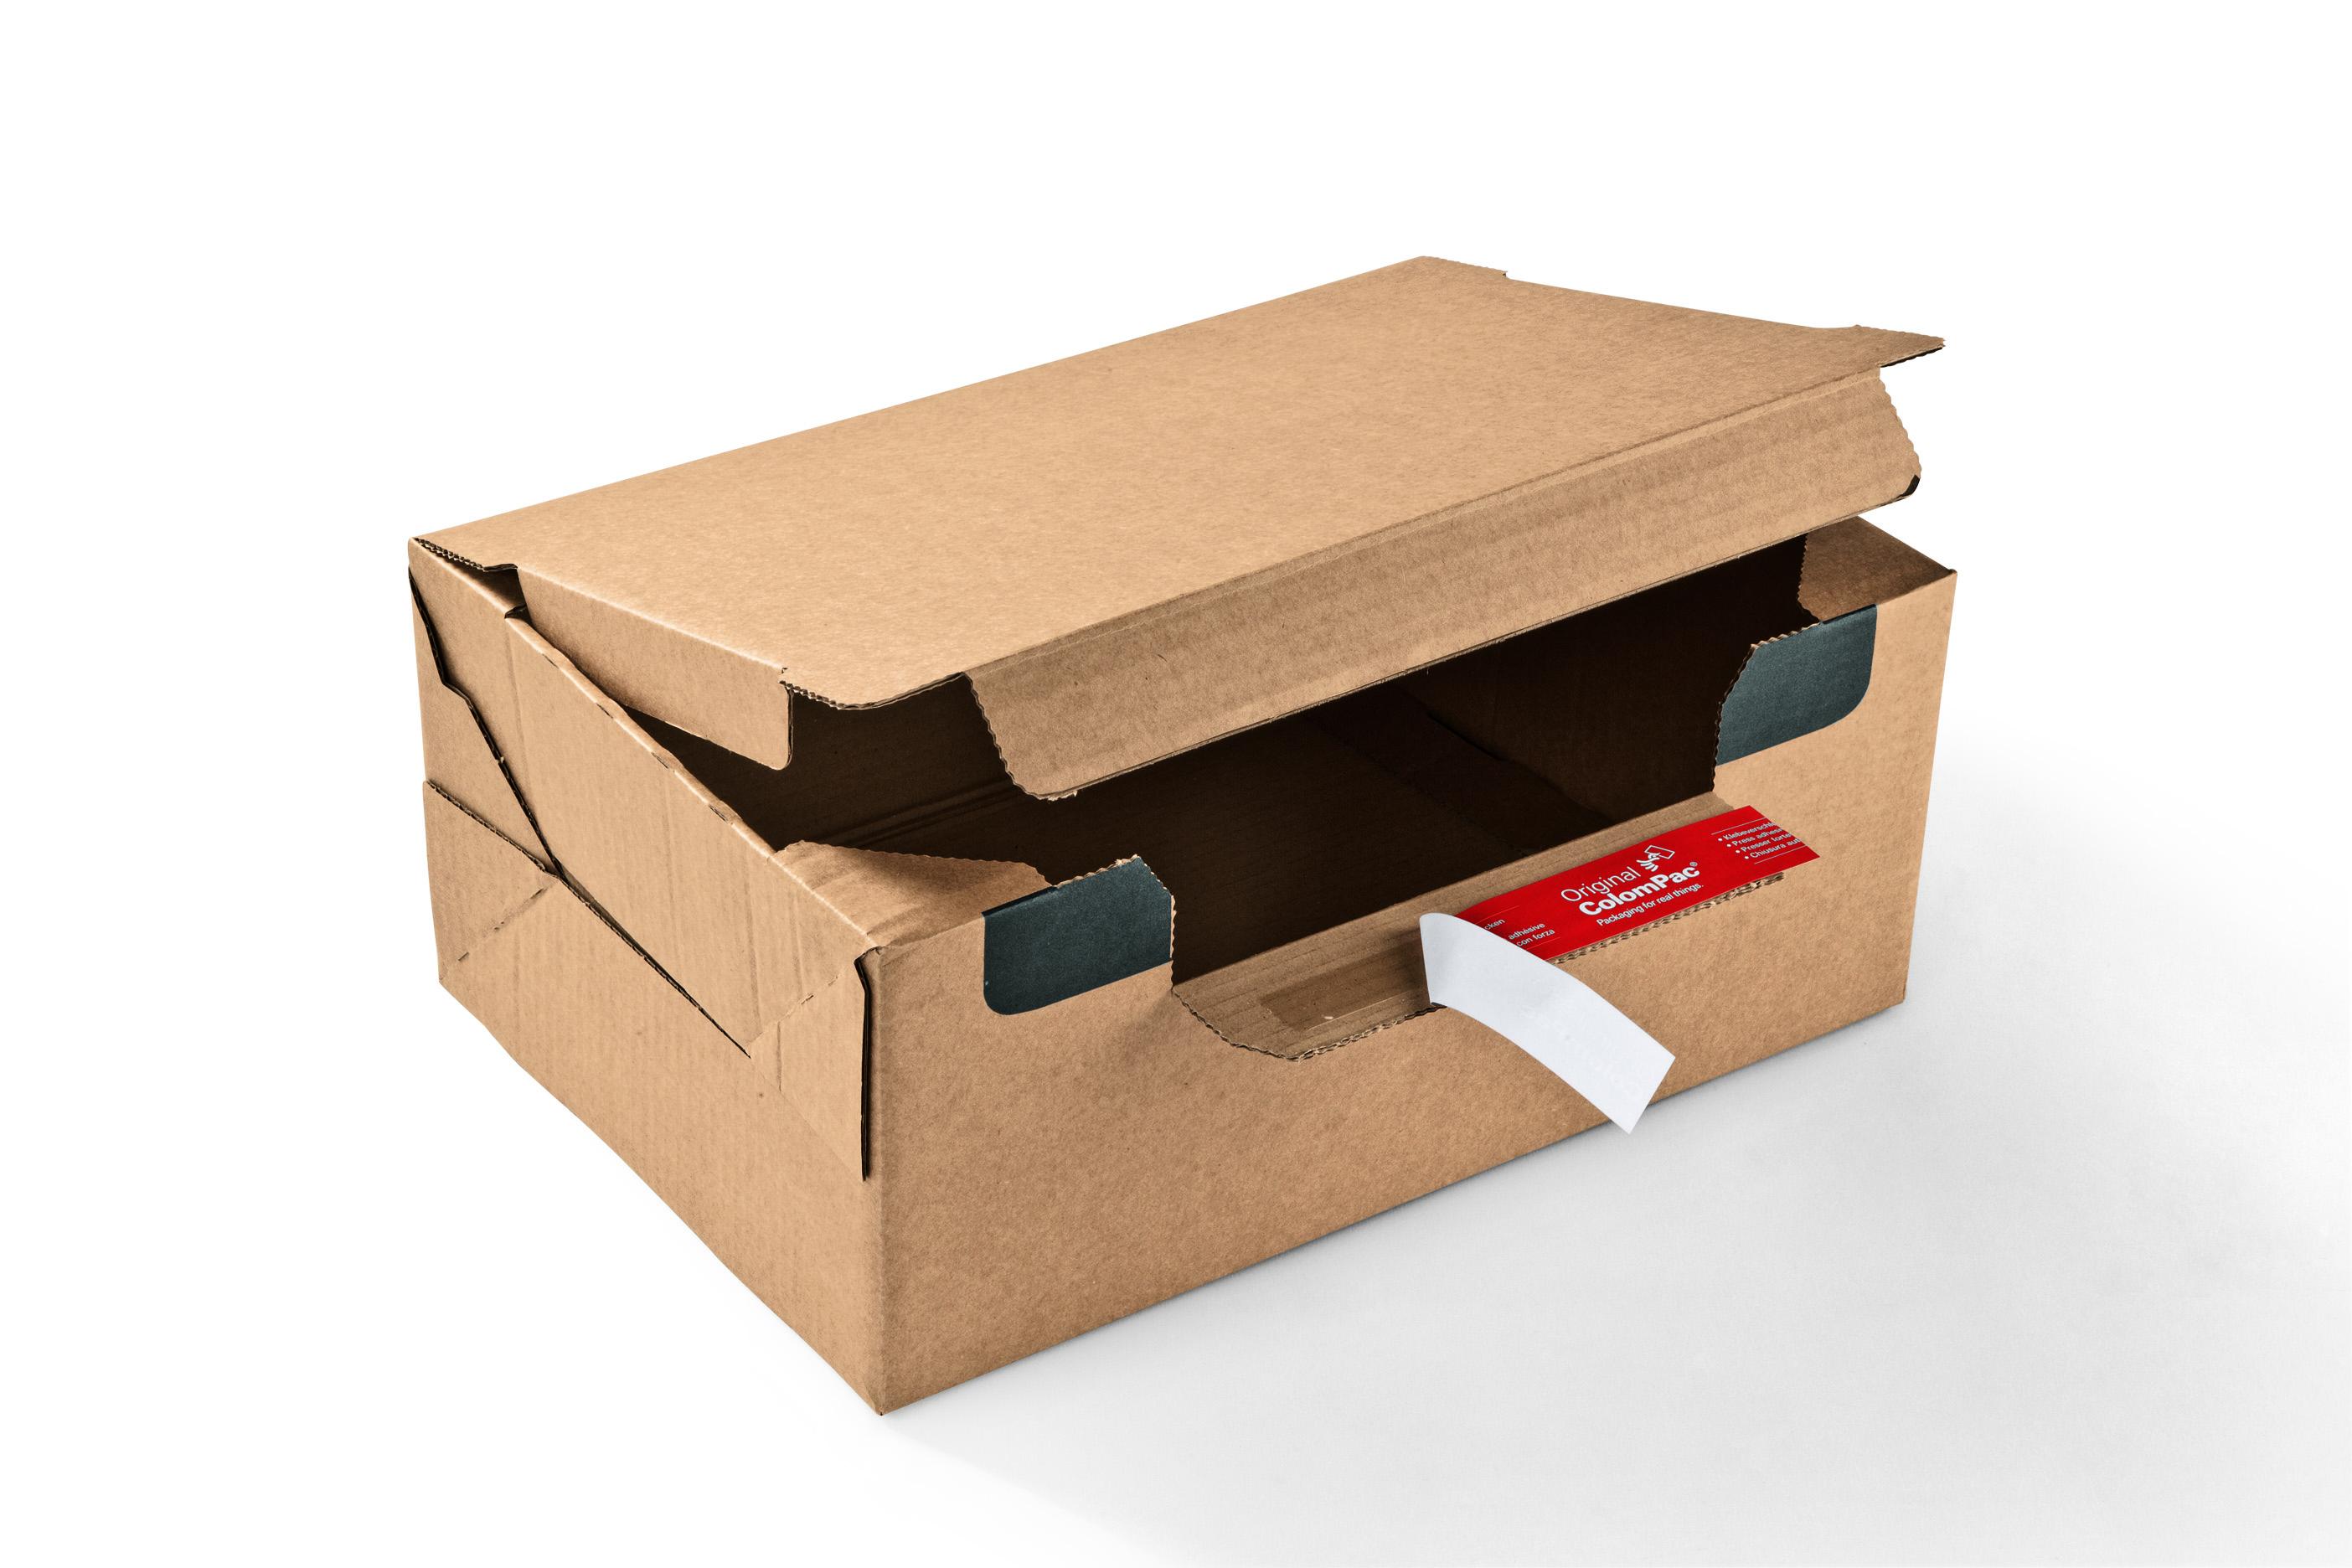 Colompac Retourbox